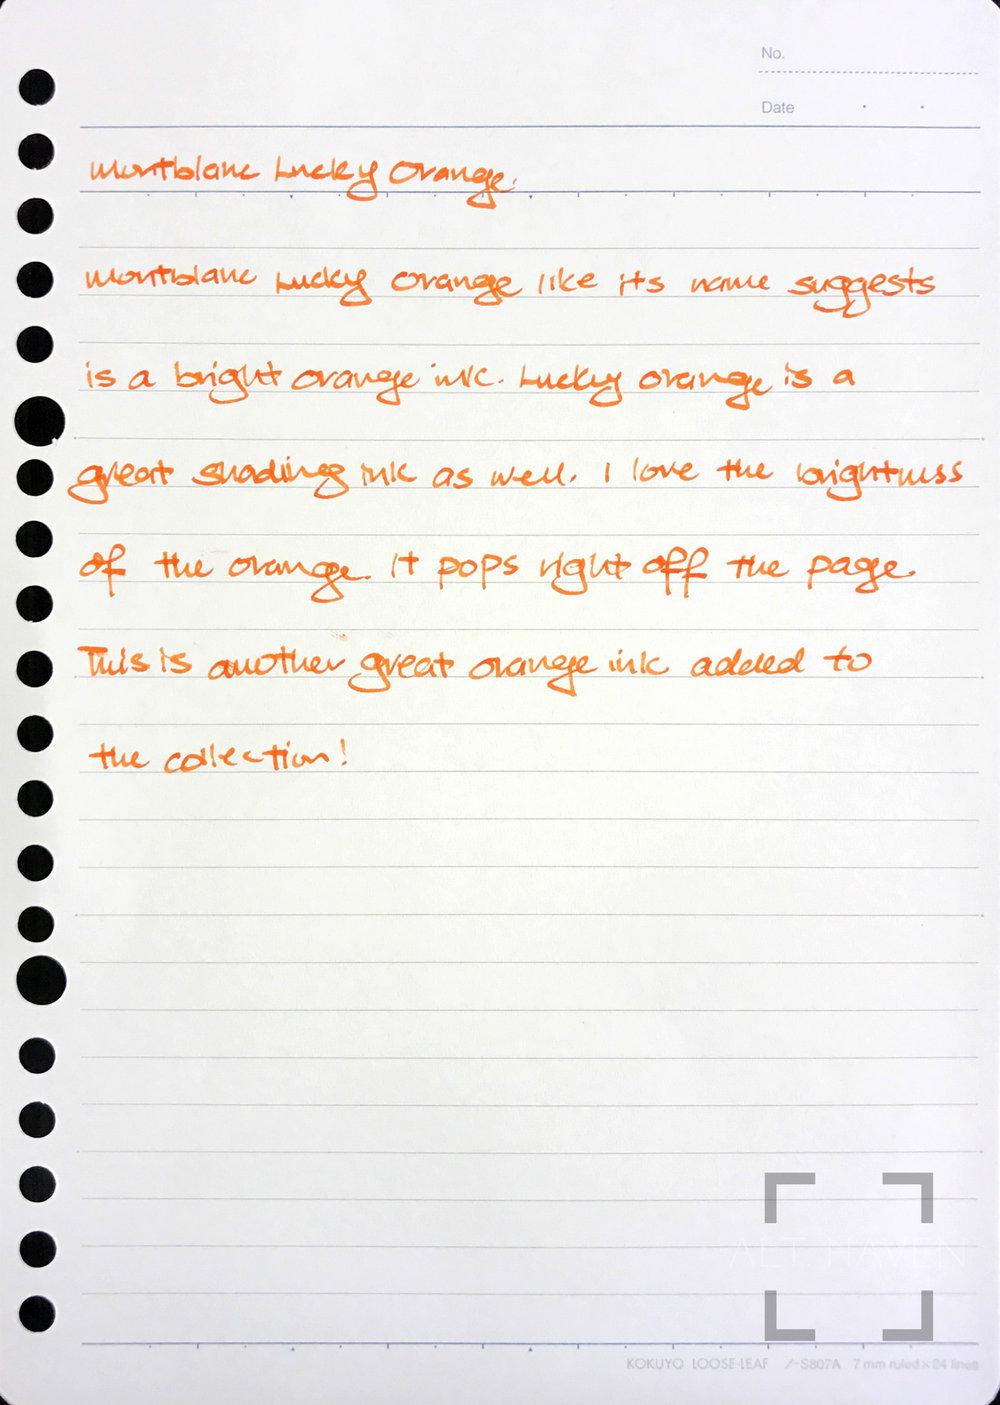 Montblanc Lucky Orange 2.jpg